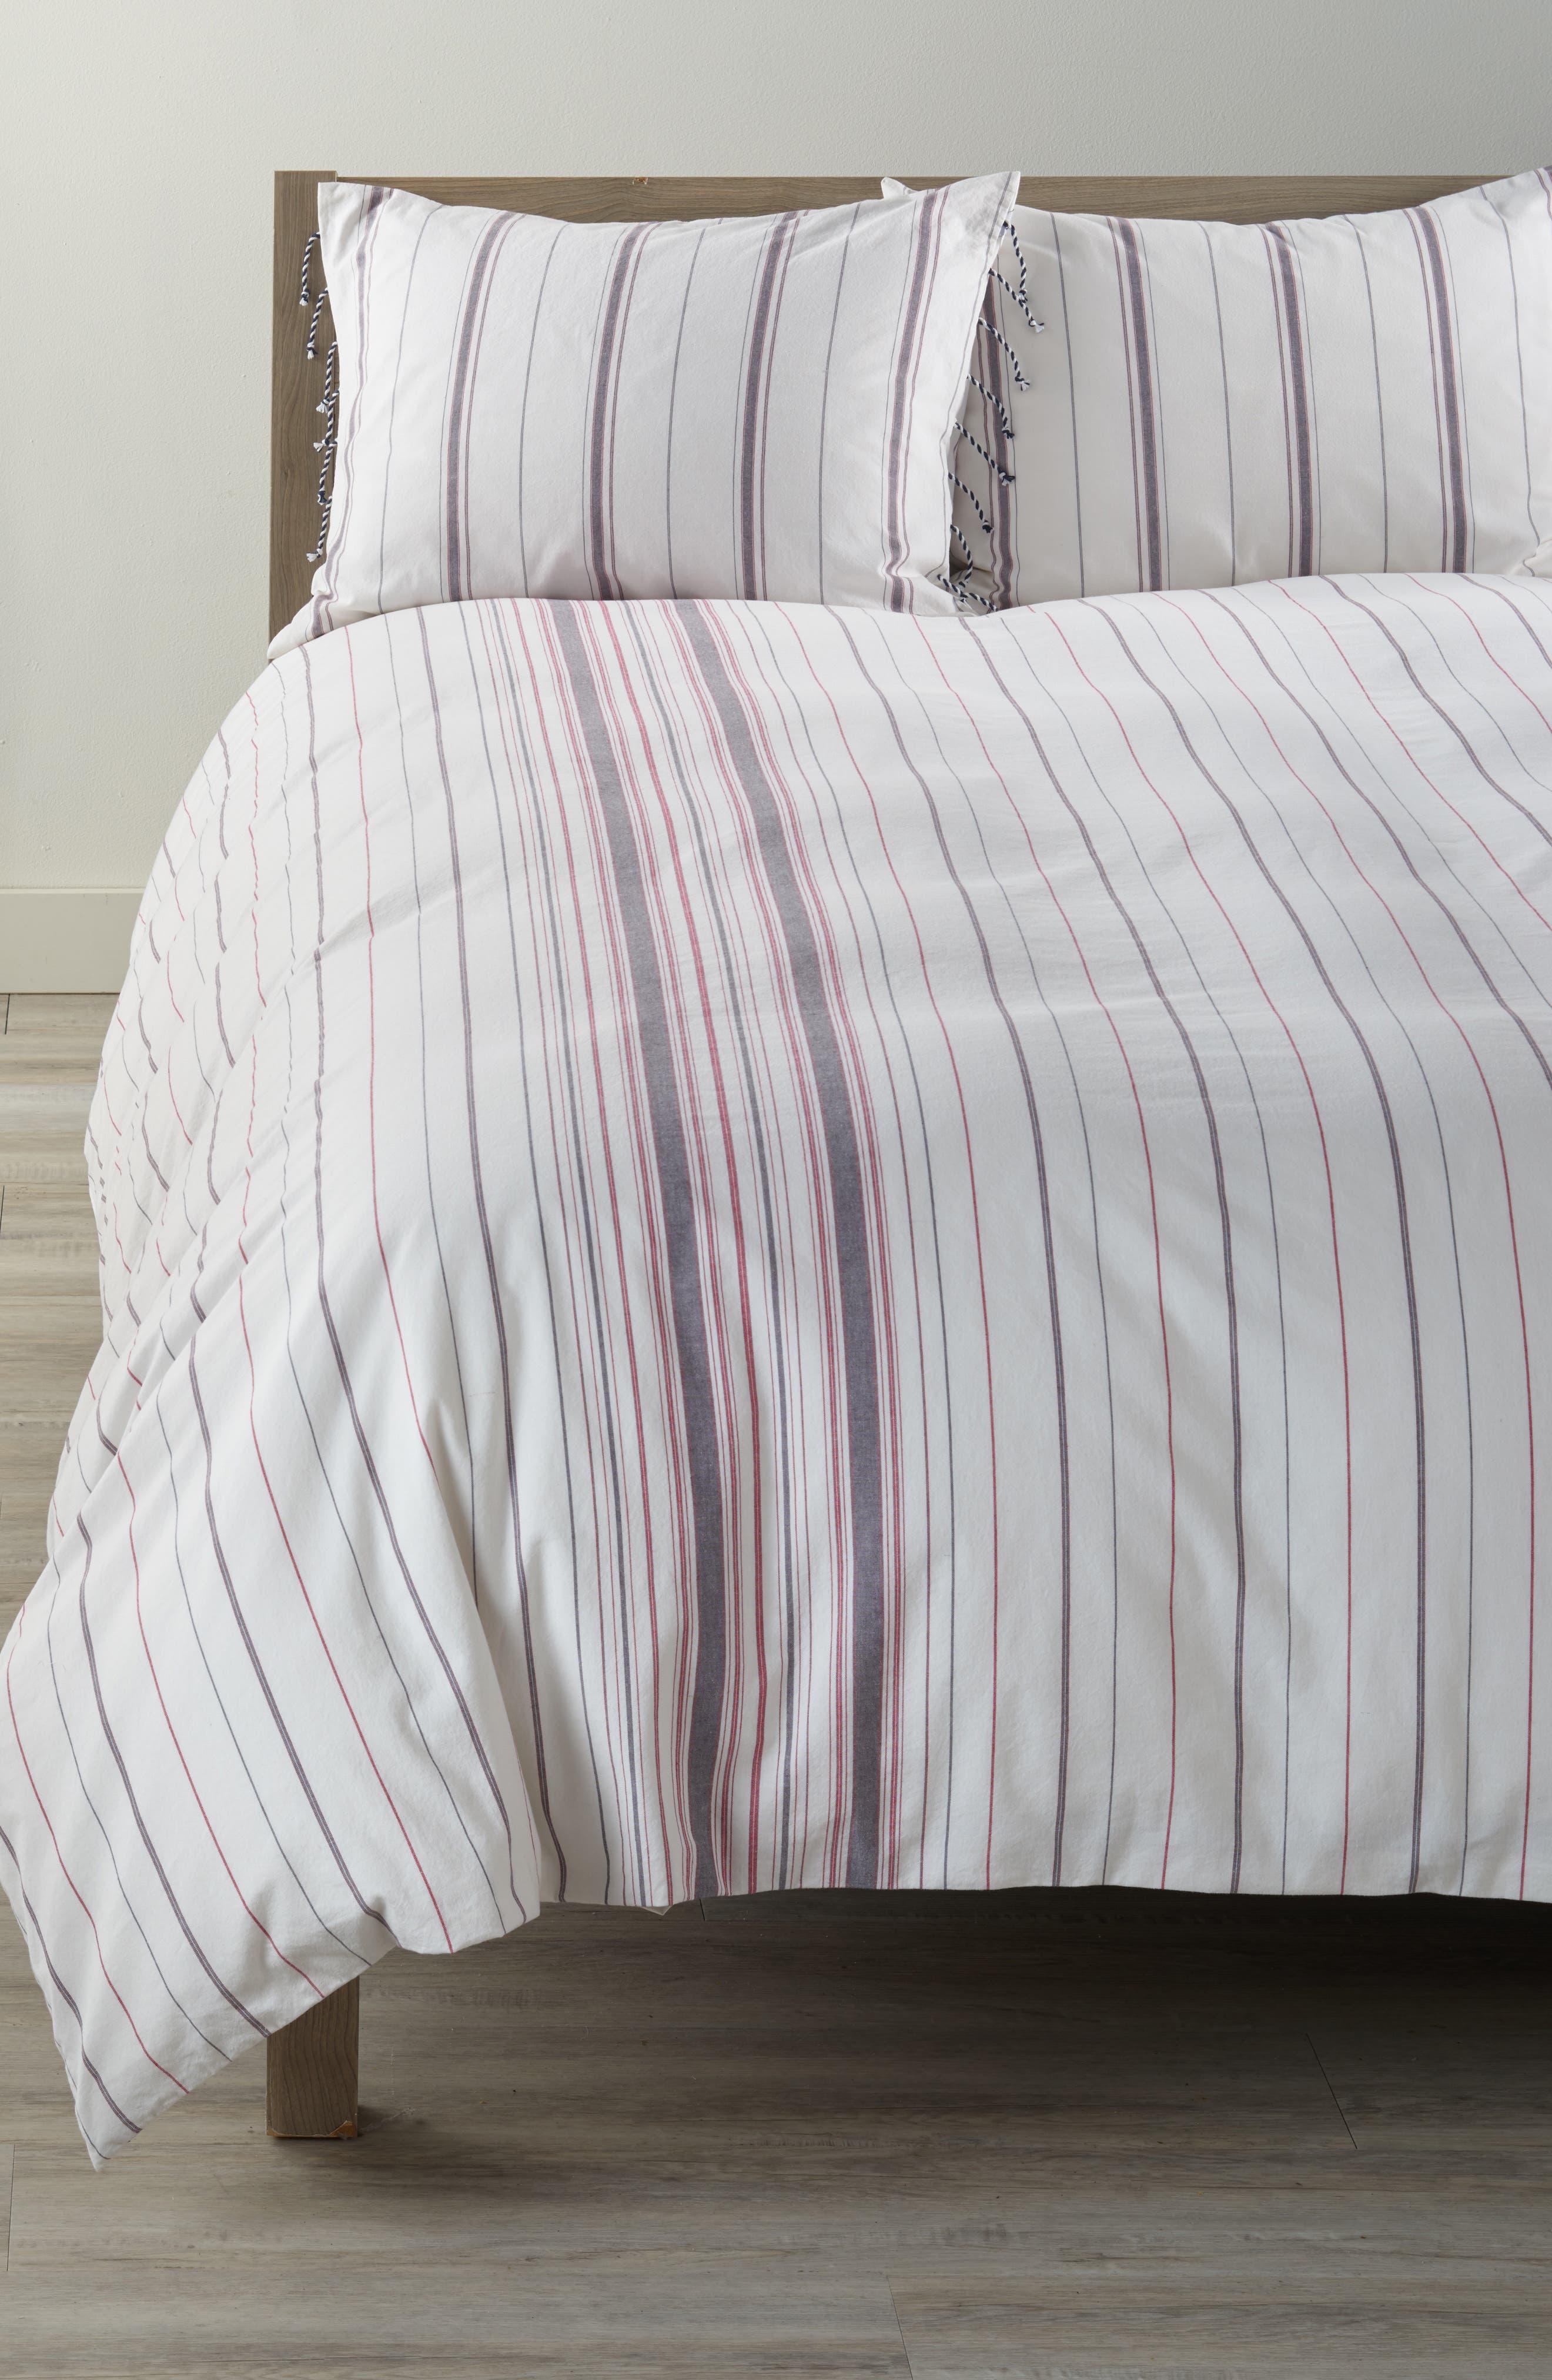 Mixed Stripe Duvet Cover,                         Main,                         color, Ivory/ Multi